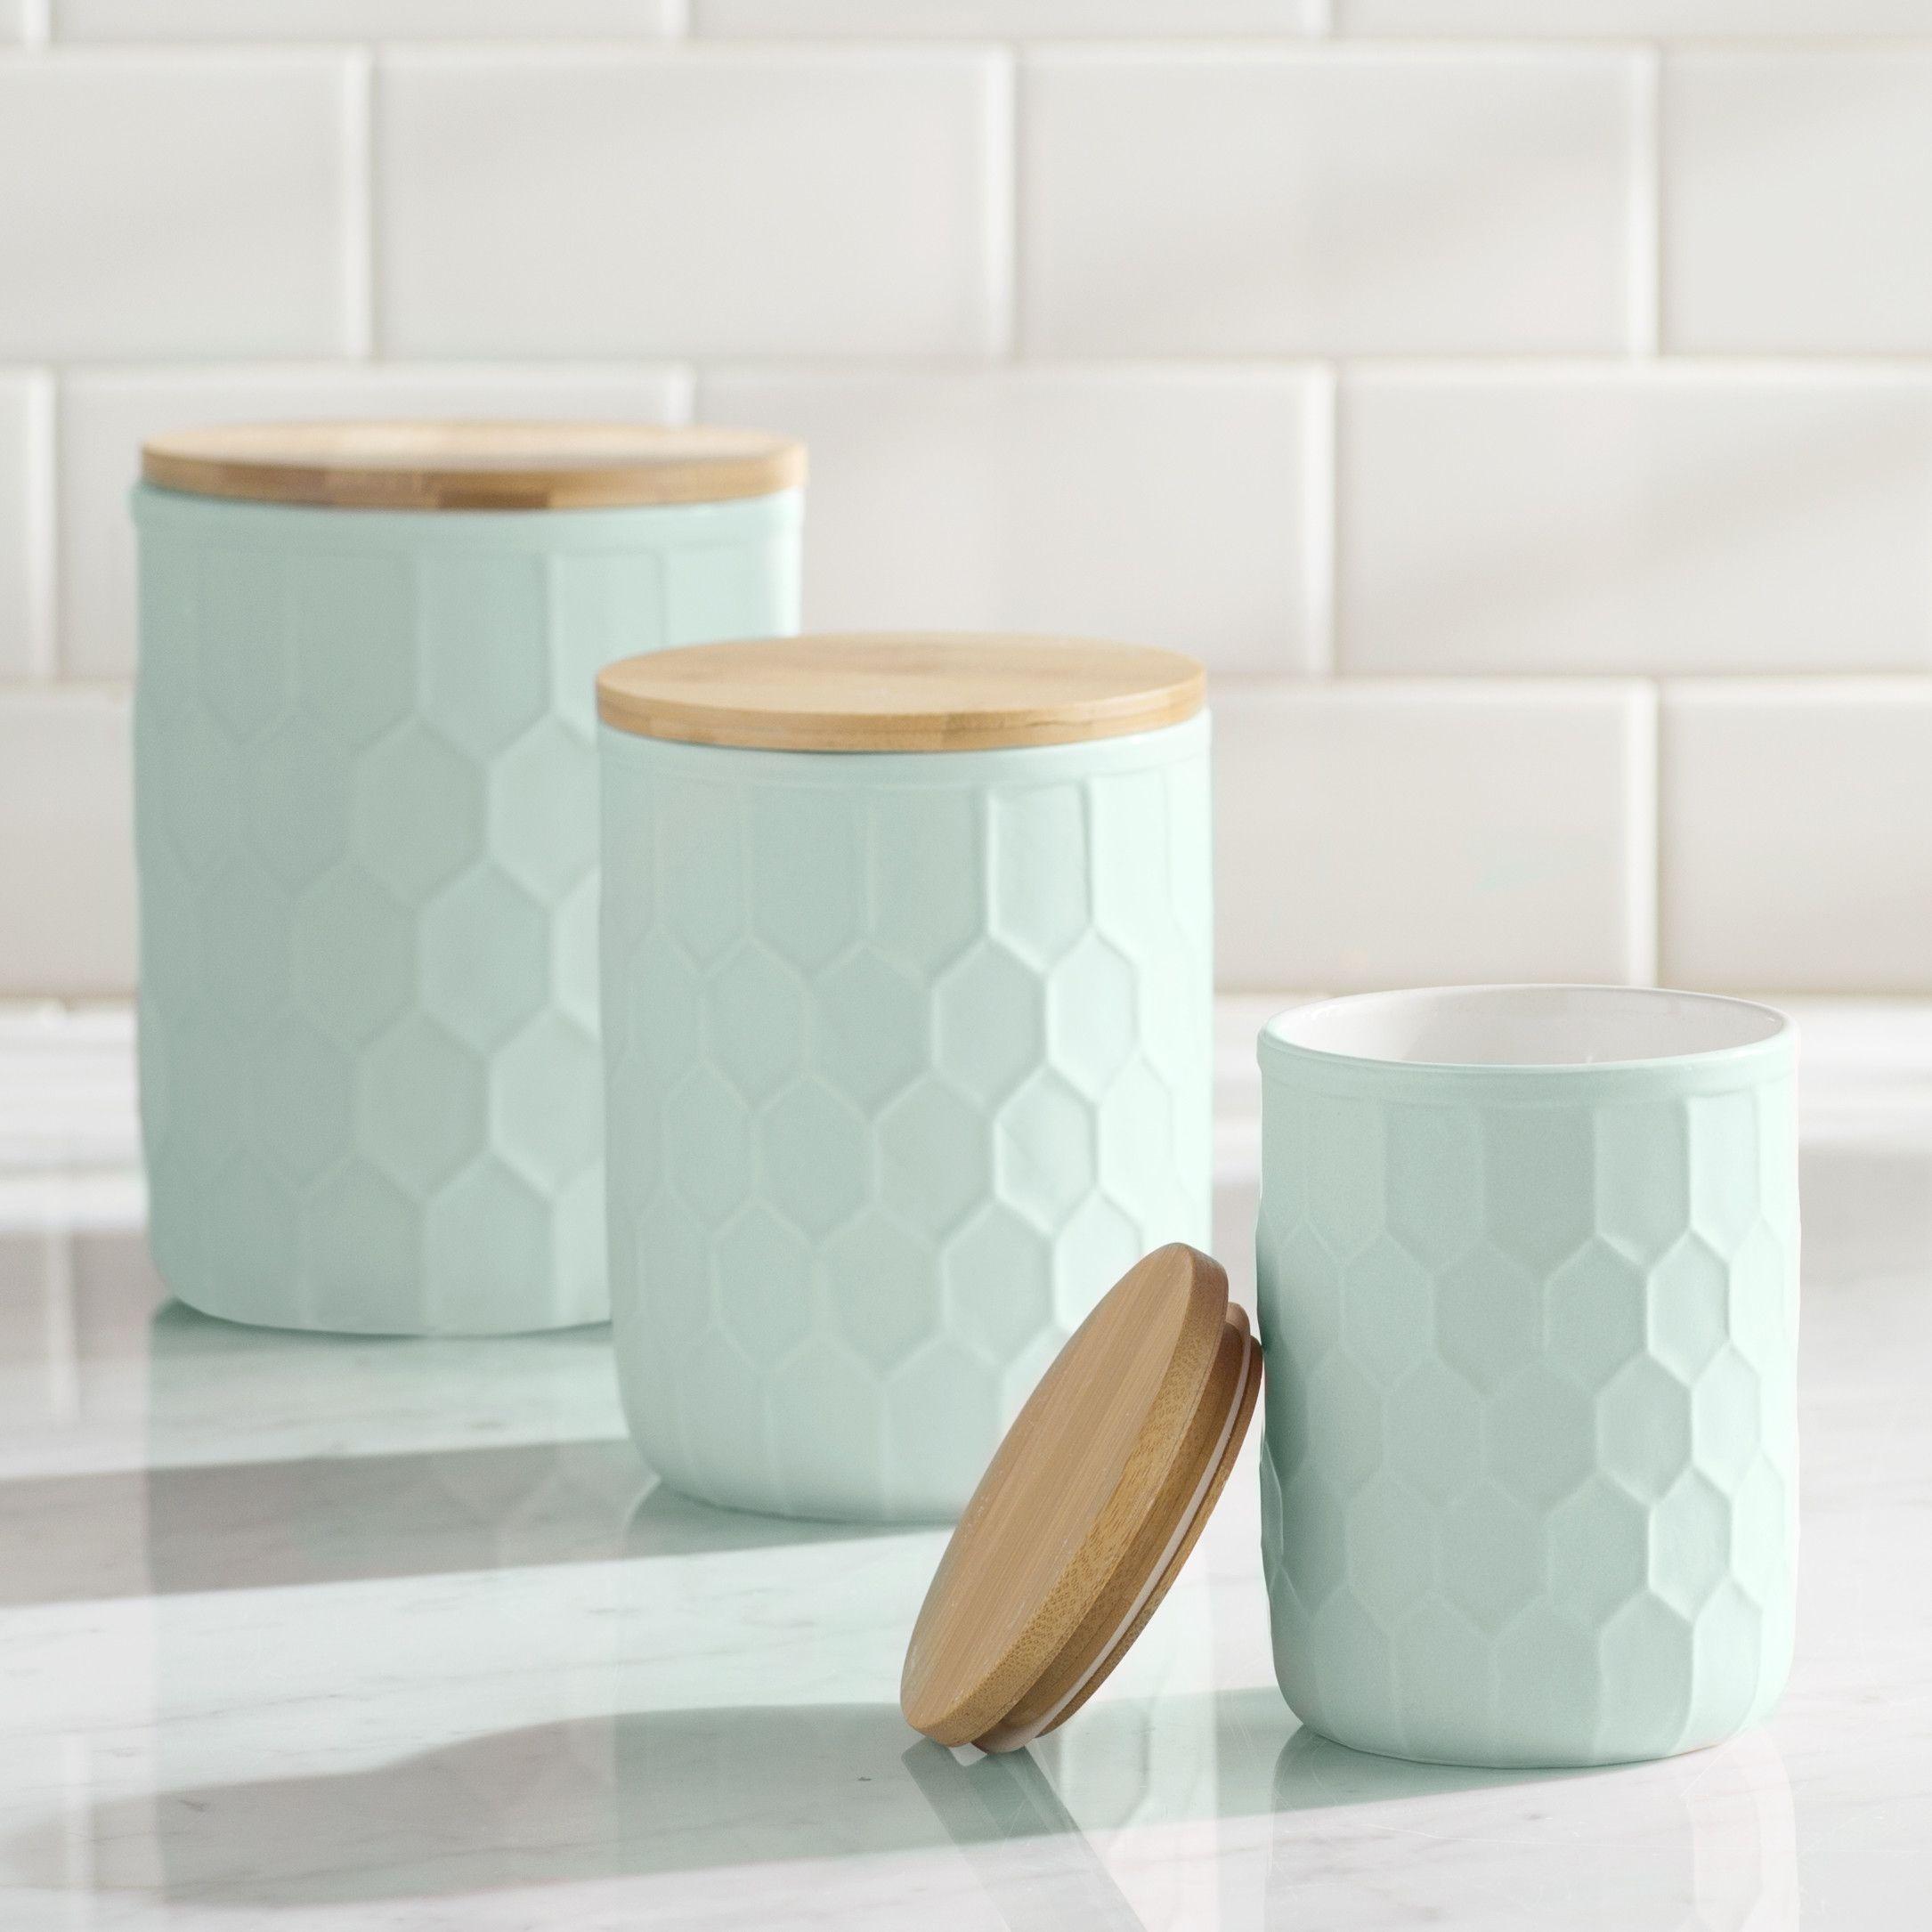 Scandinavian 3 Piece Kitchen Canister Set | kitchen | Pinterest ...